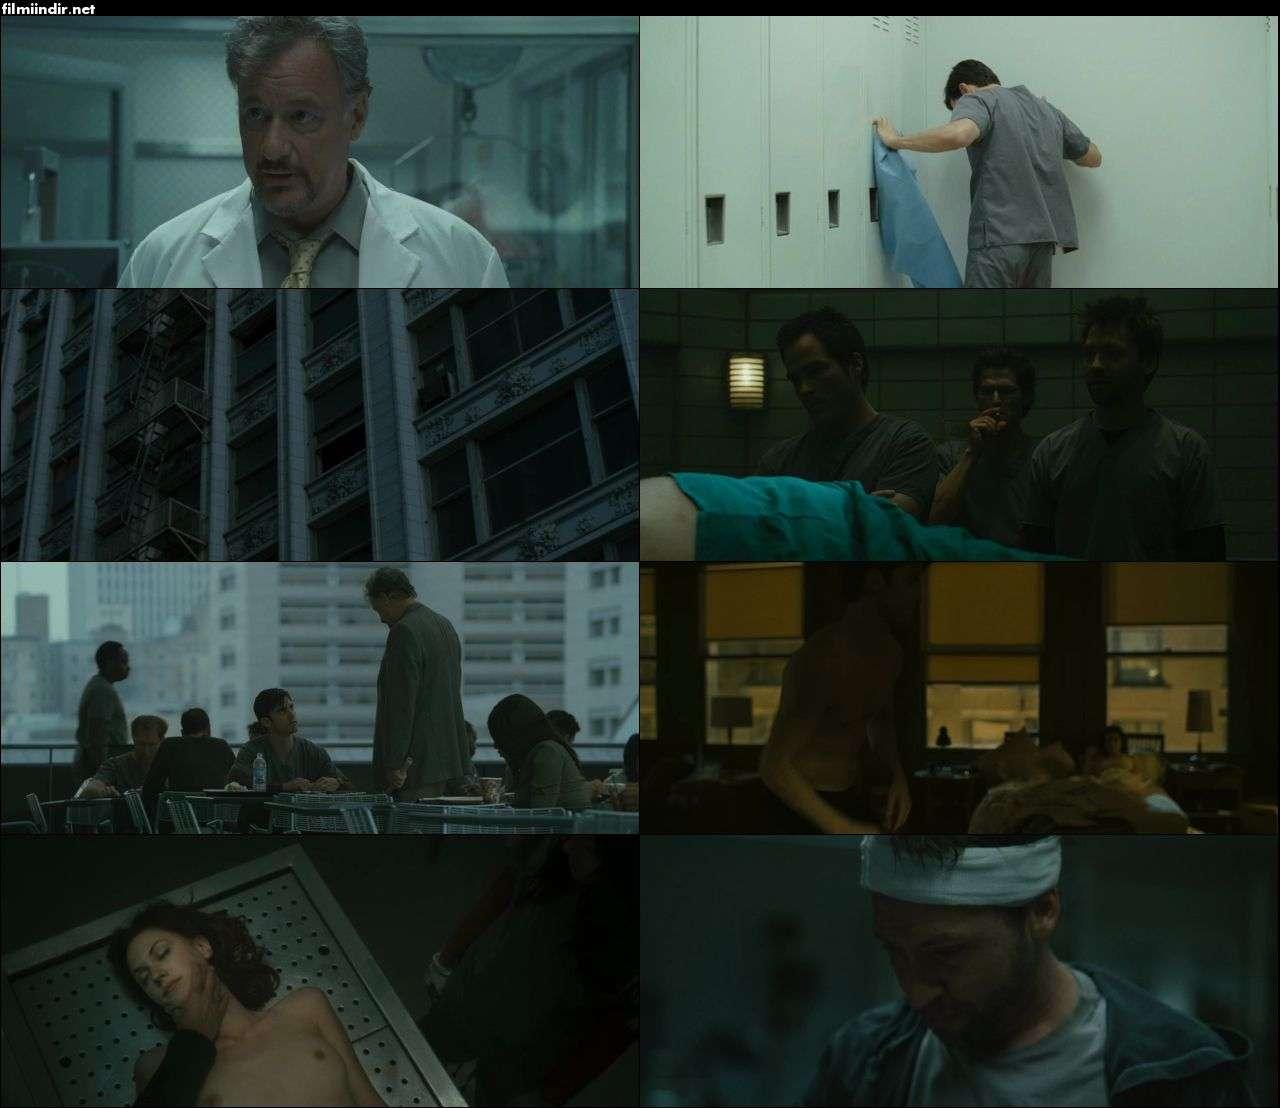 Kadavra - Pathology (2008) türkçe dublaj film indir